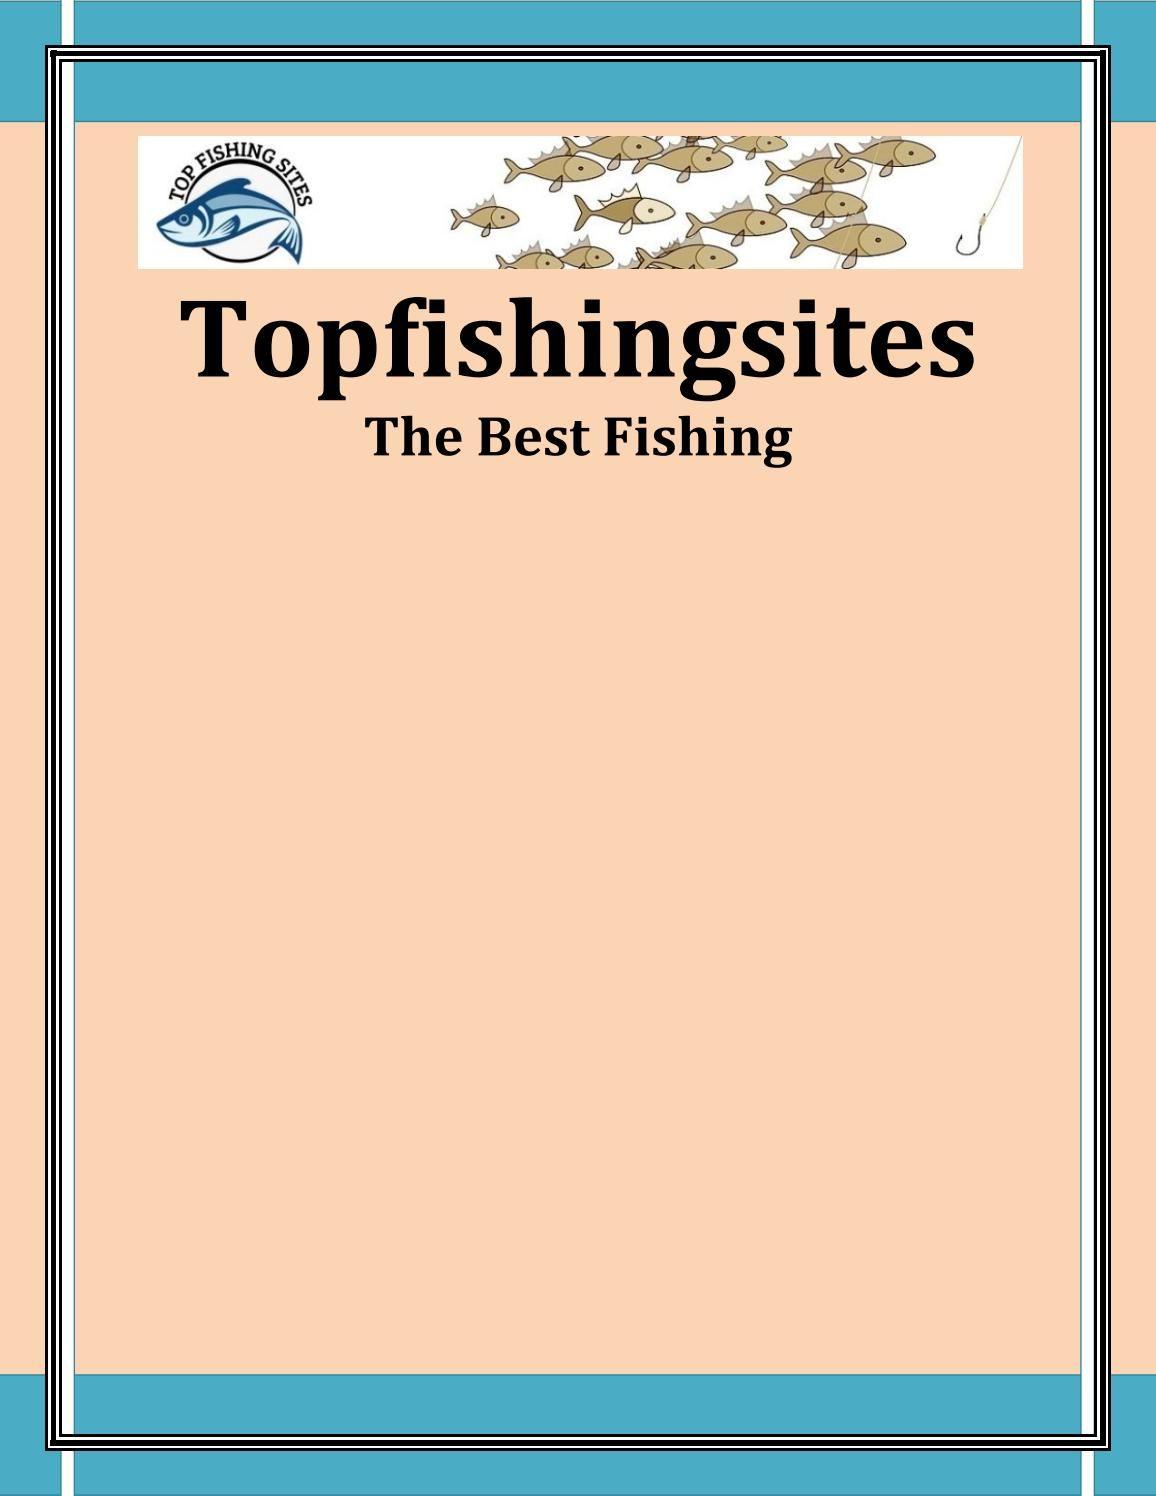 Top Fishing